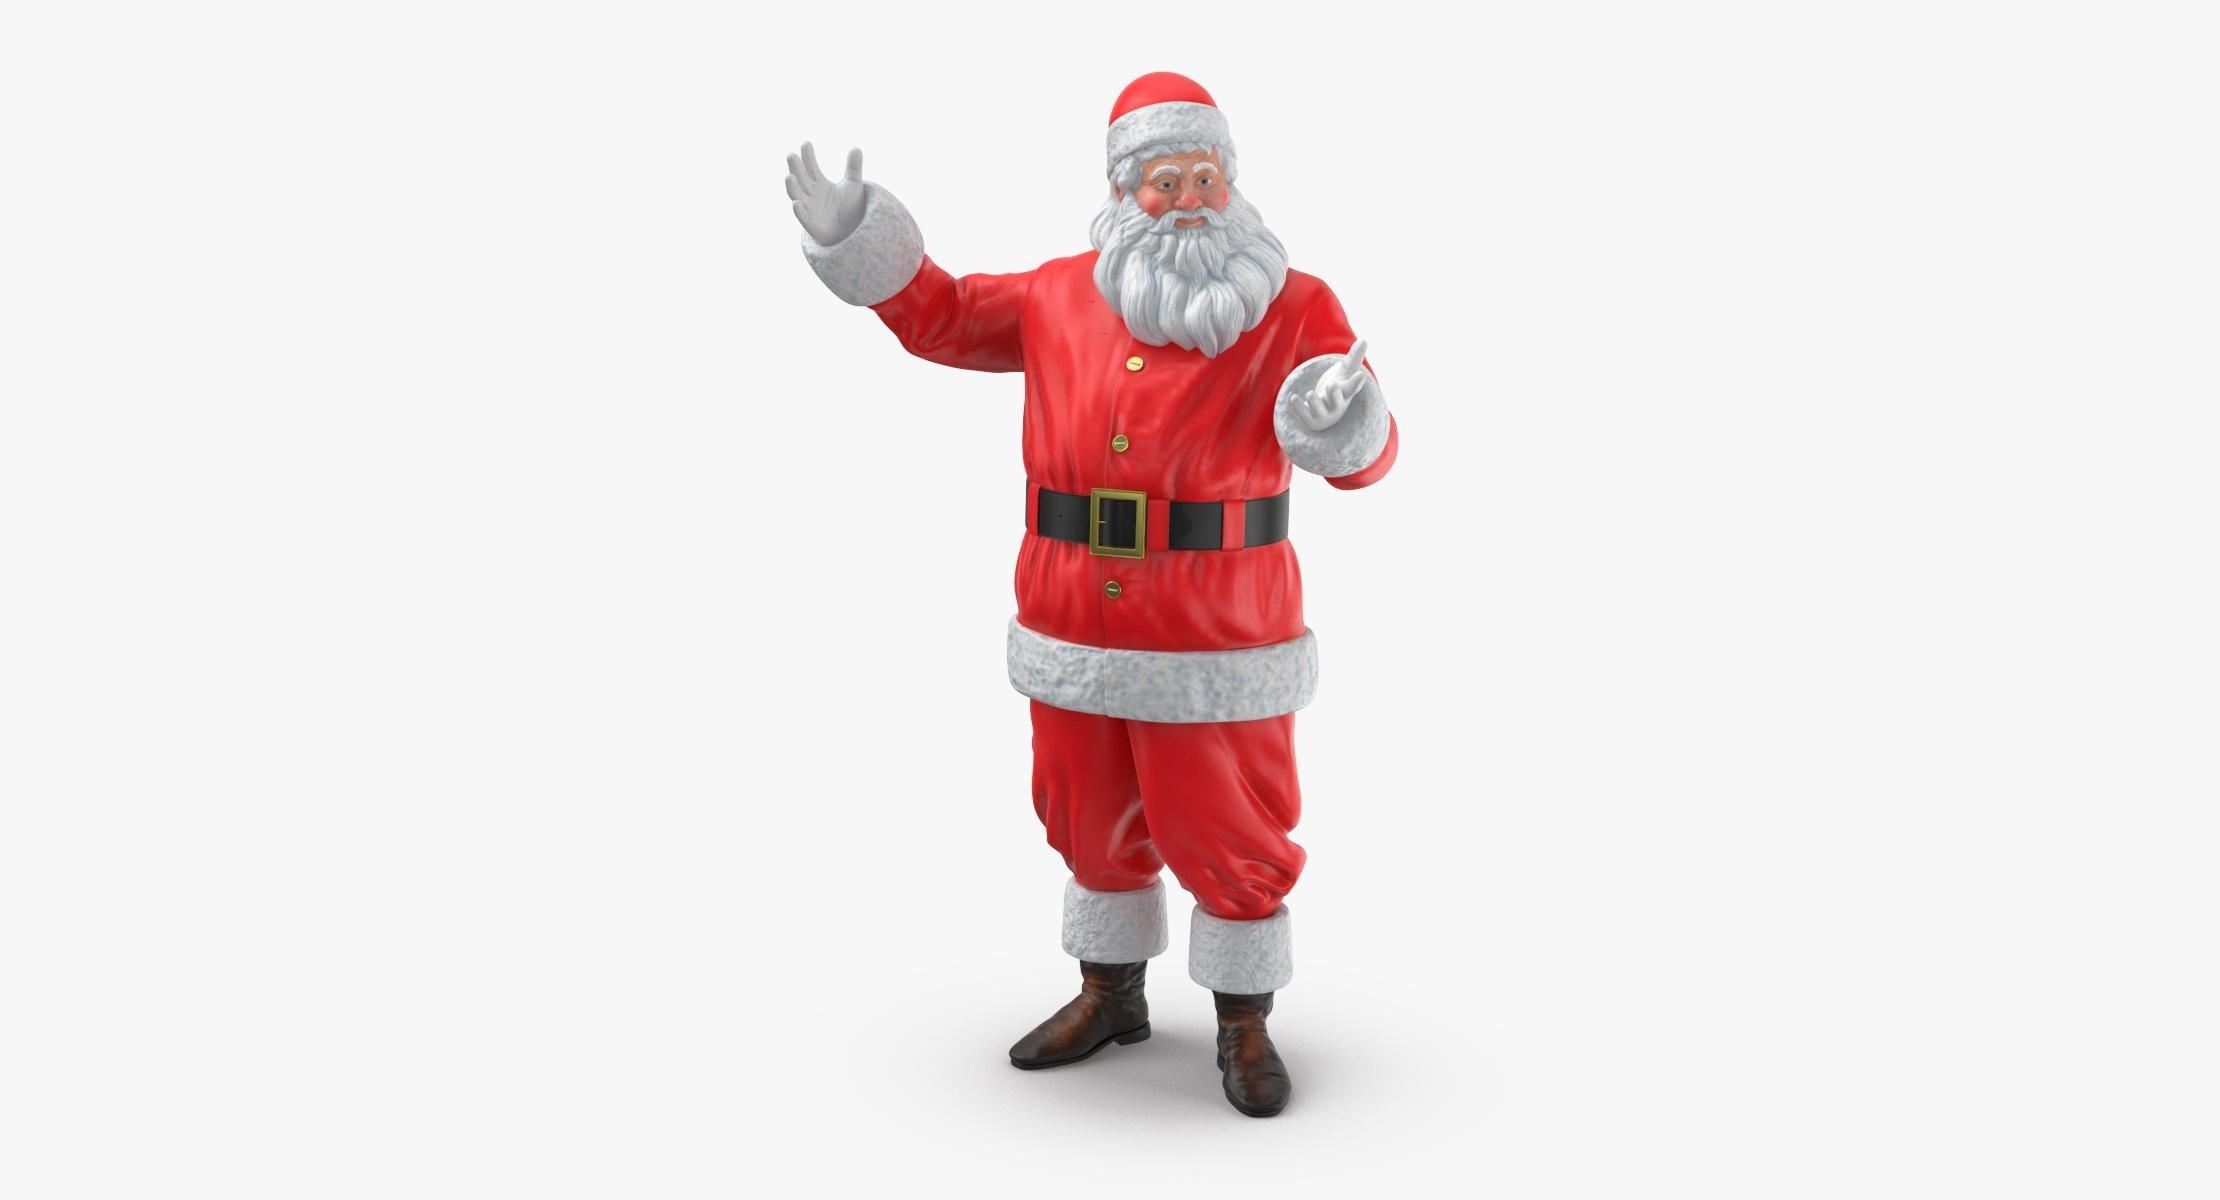 Santa Claus Figure Pose 02 - reel 1